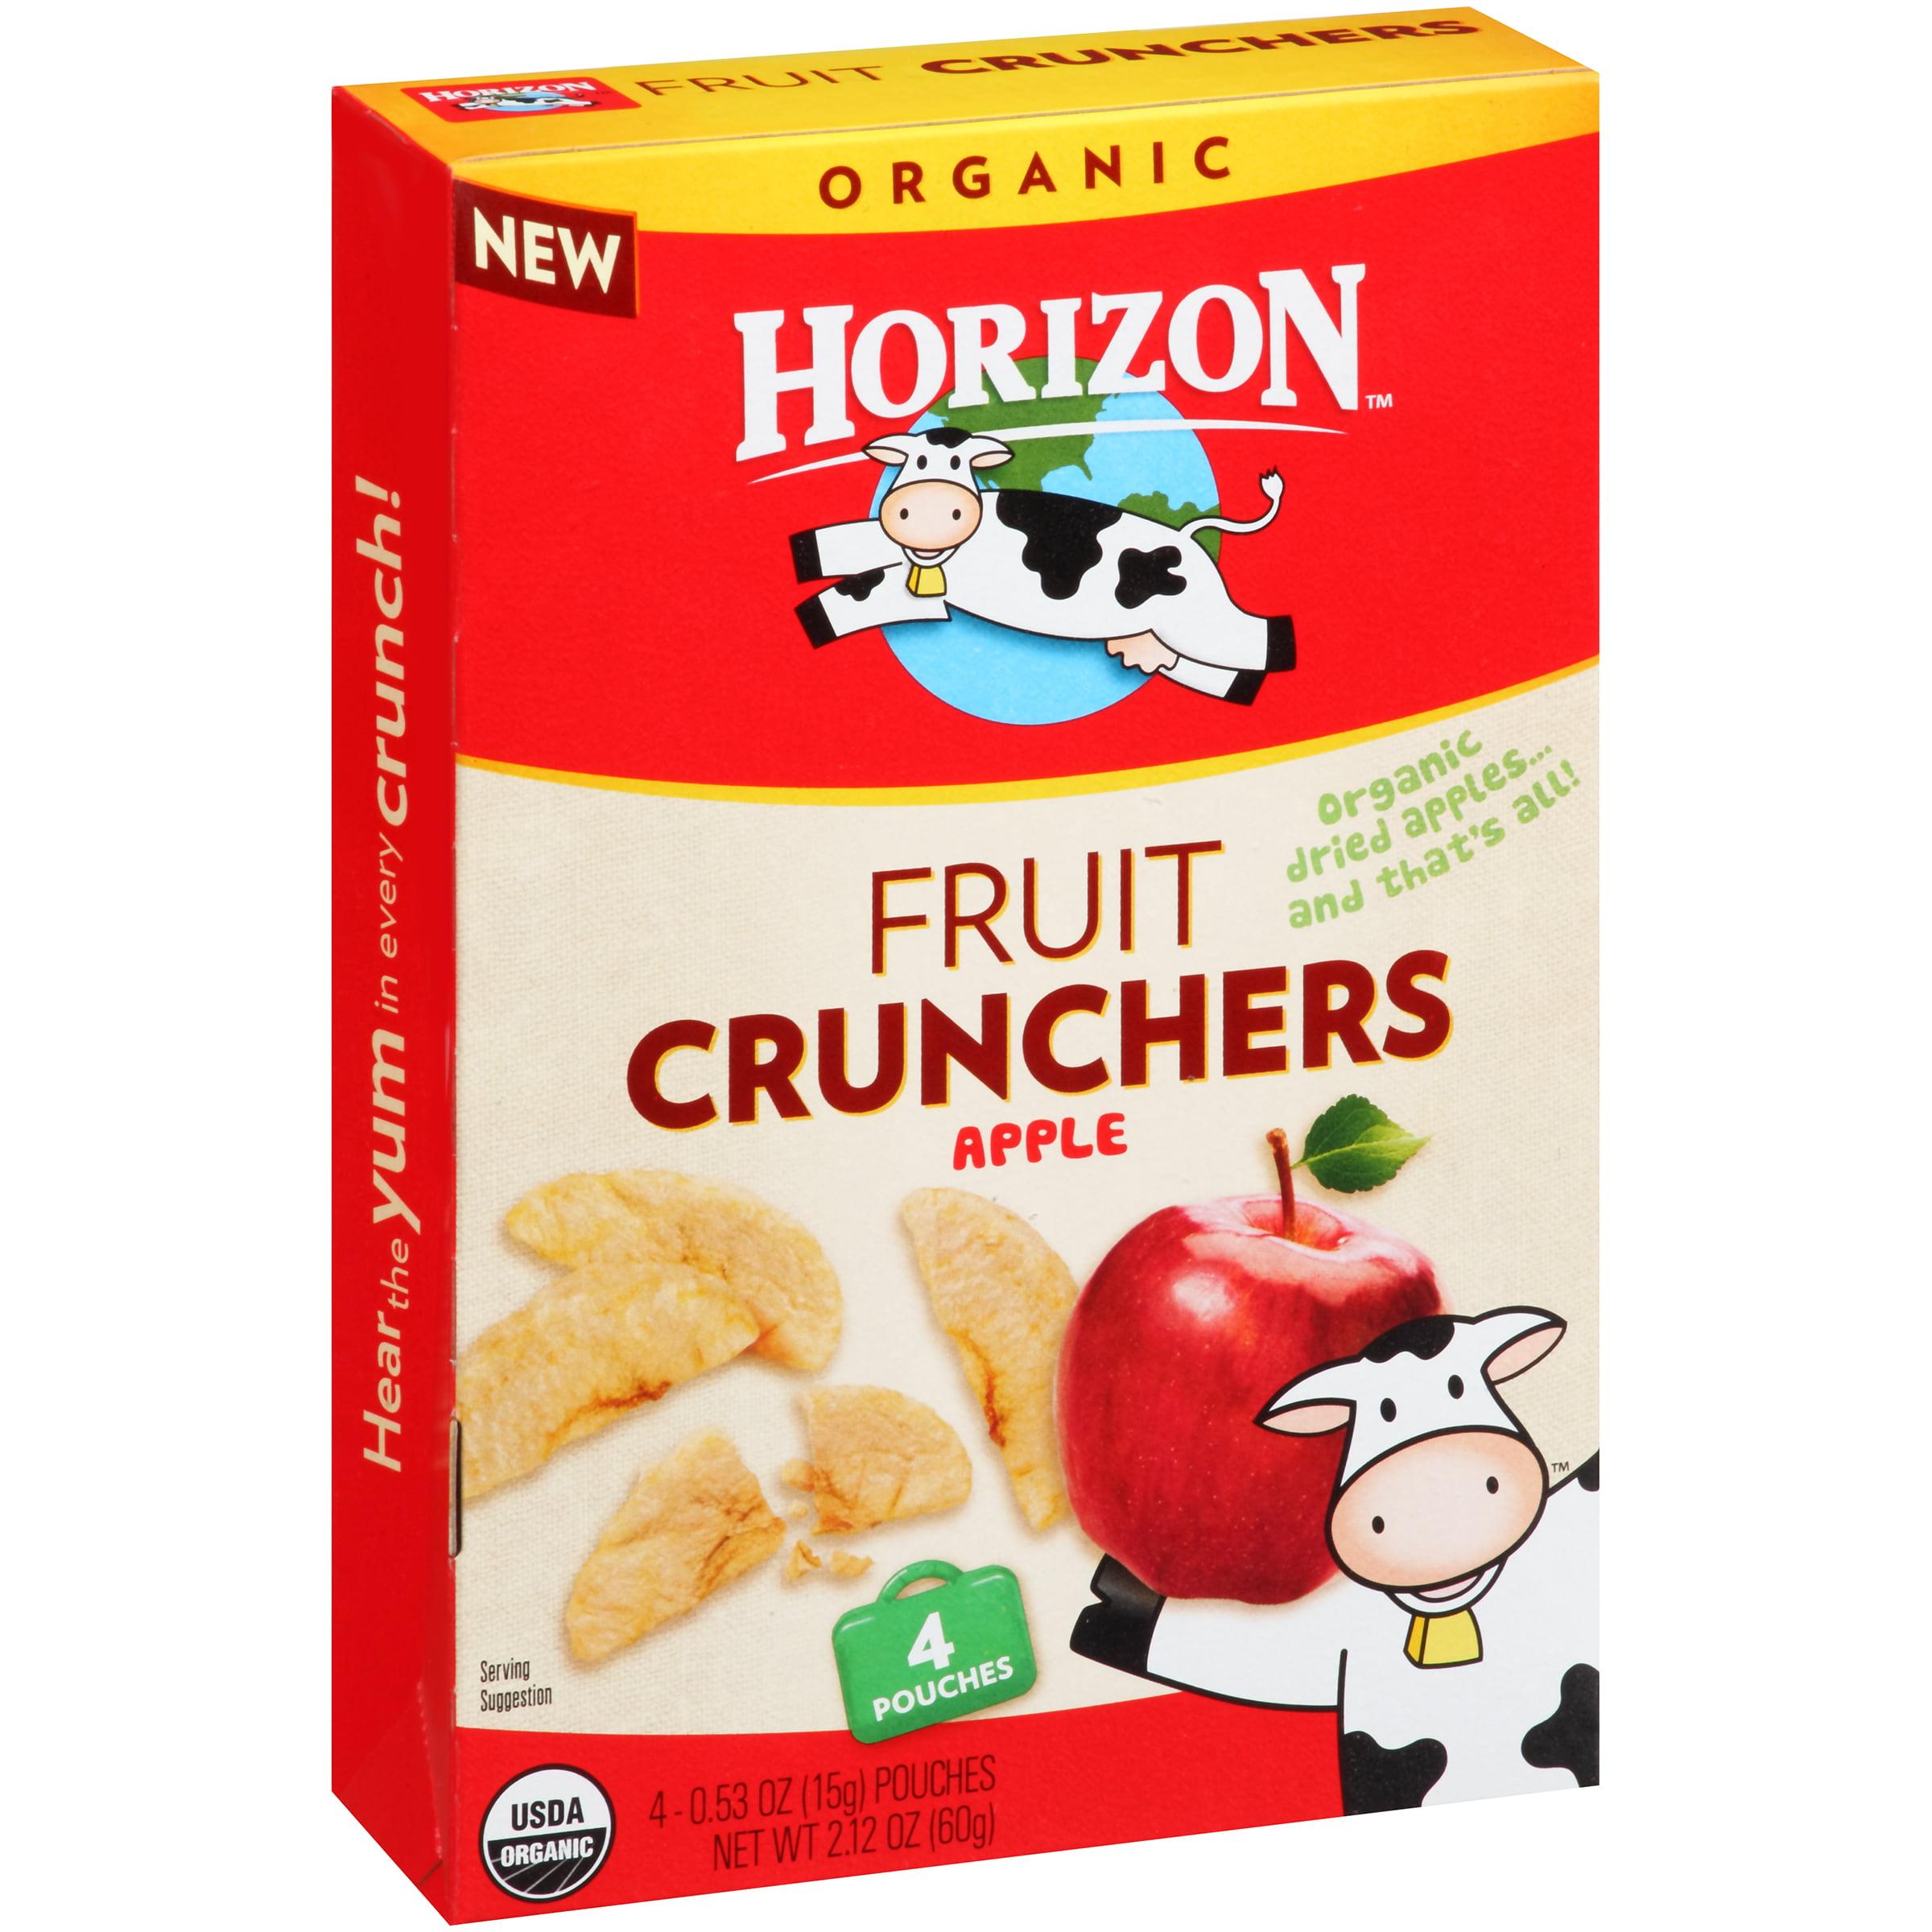 Horizon��� Organic Apple Fruit Crunches 4-0.53 oz. Pouches